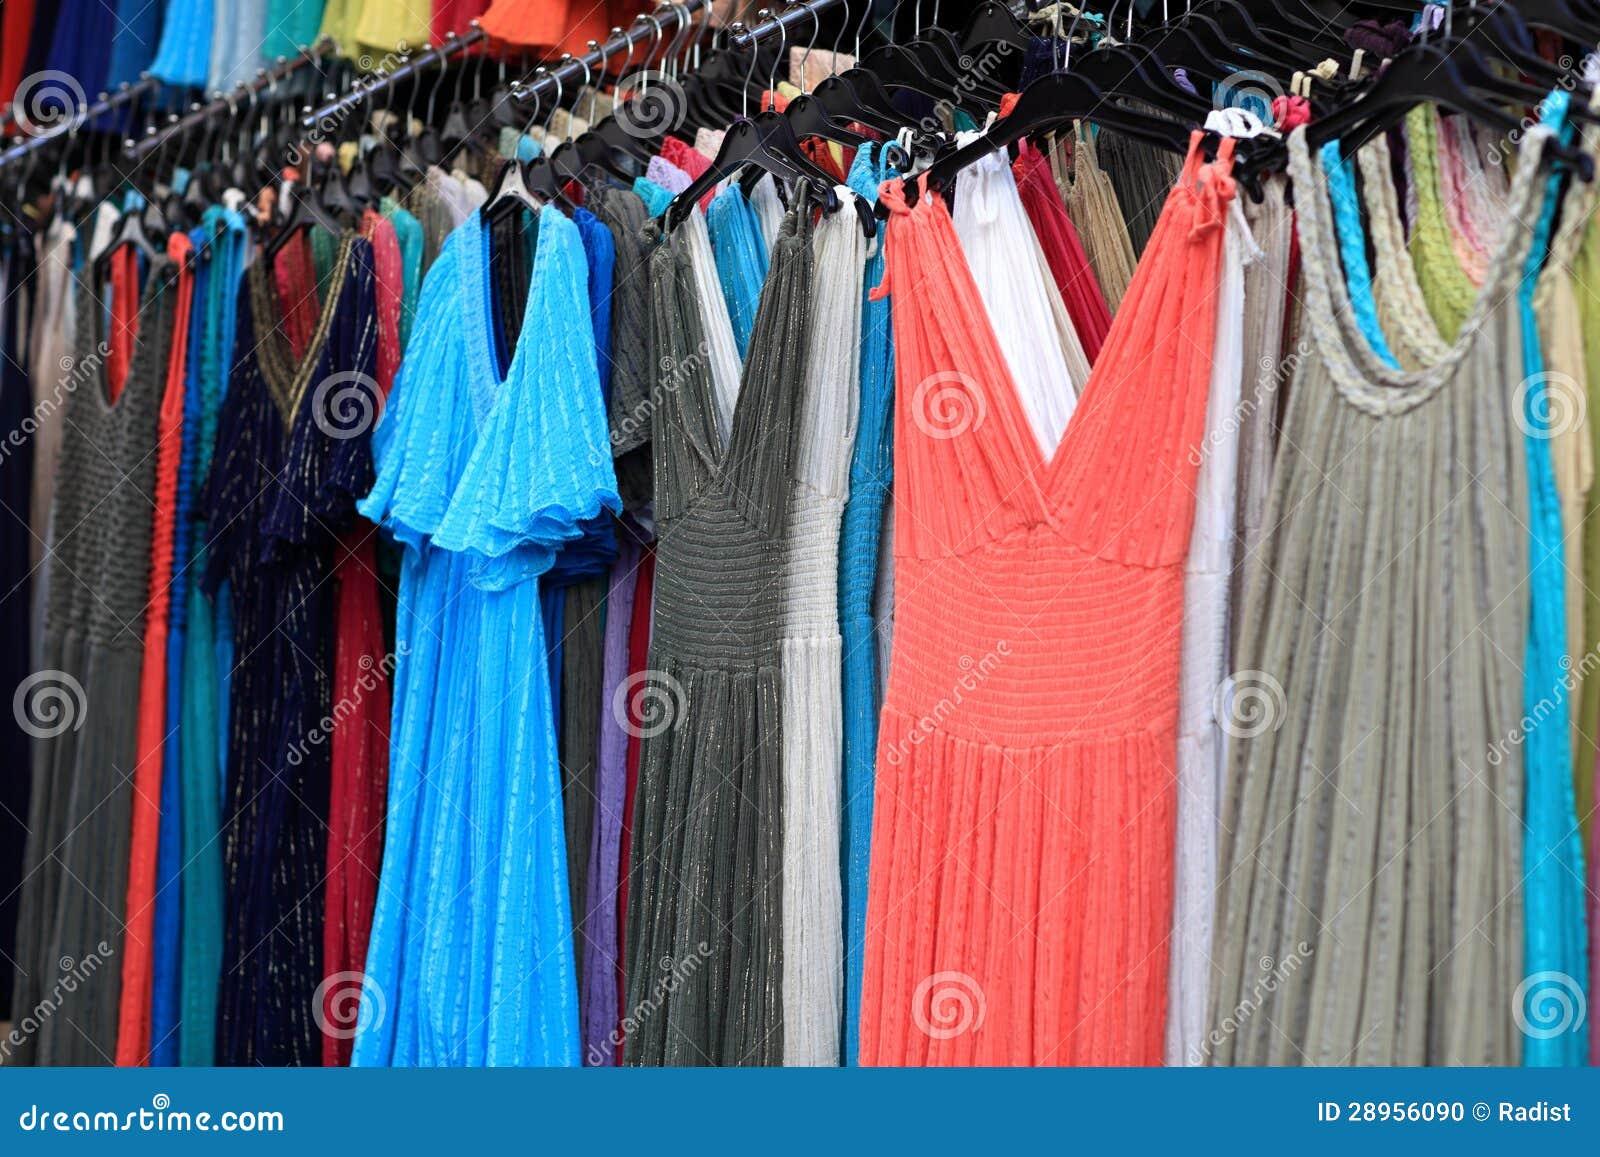 c850ca76e4f Θερινά φορέματα στην αγορά στοκ εικόνες. εικόνα από εσωτερικός ...